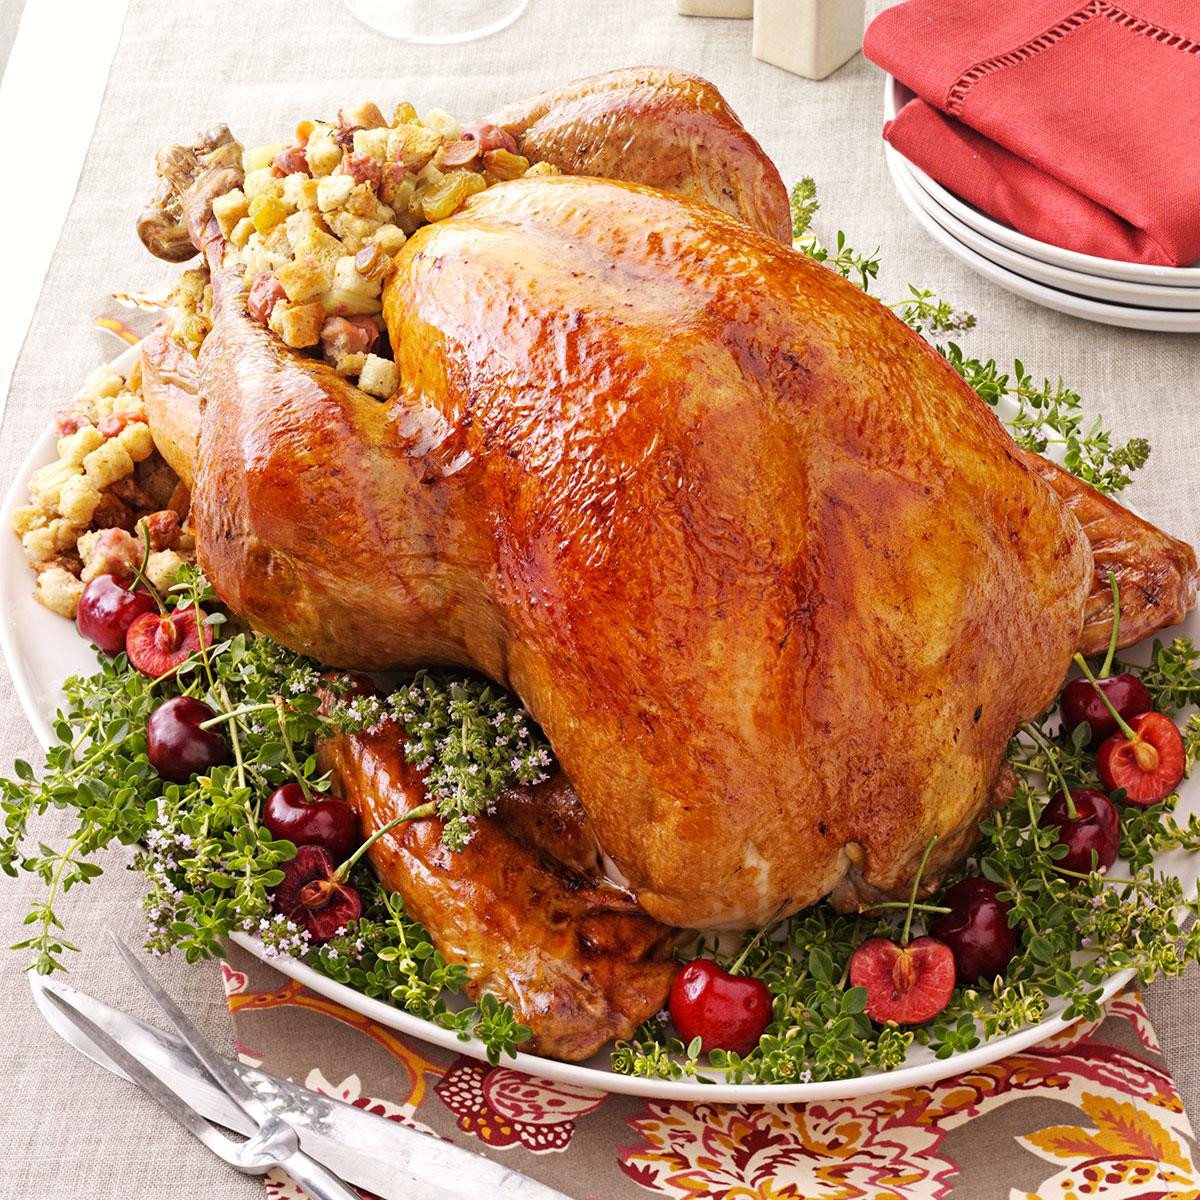 Turkey Recipe For Thanksgiving Dinner  Turkey with Cherry Stuffing Recipe